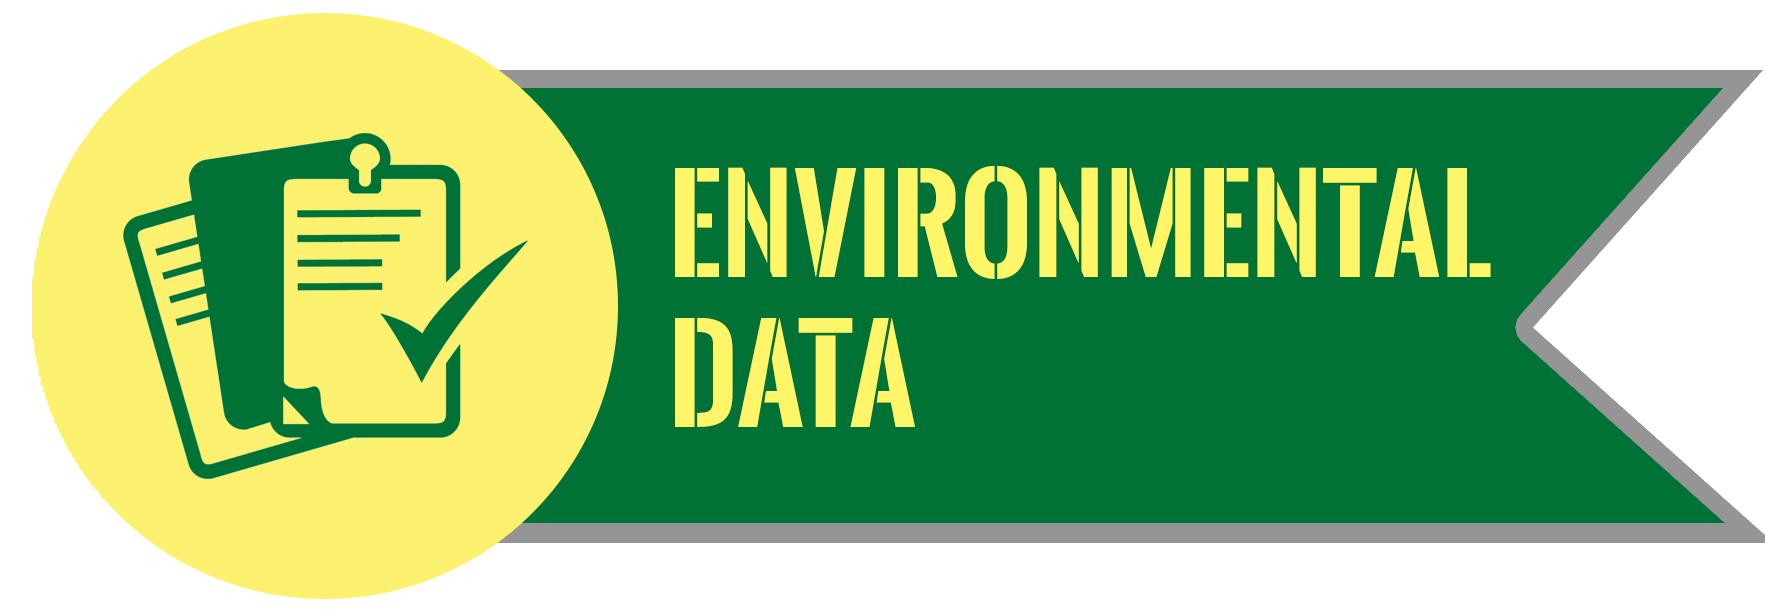 environmentaldata3-768x266